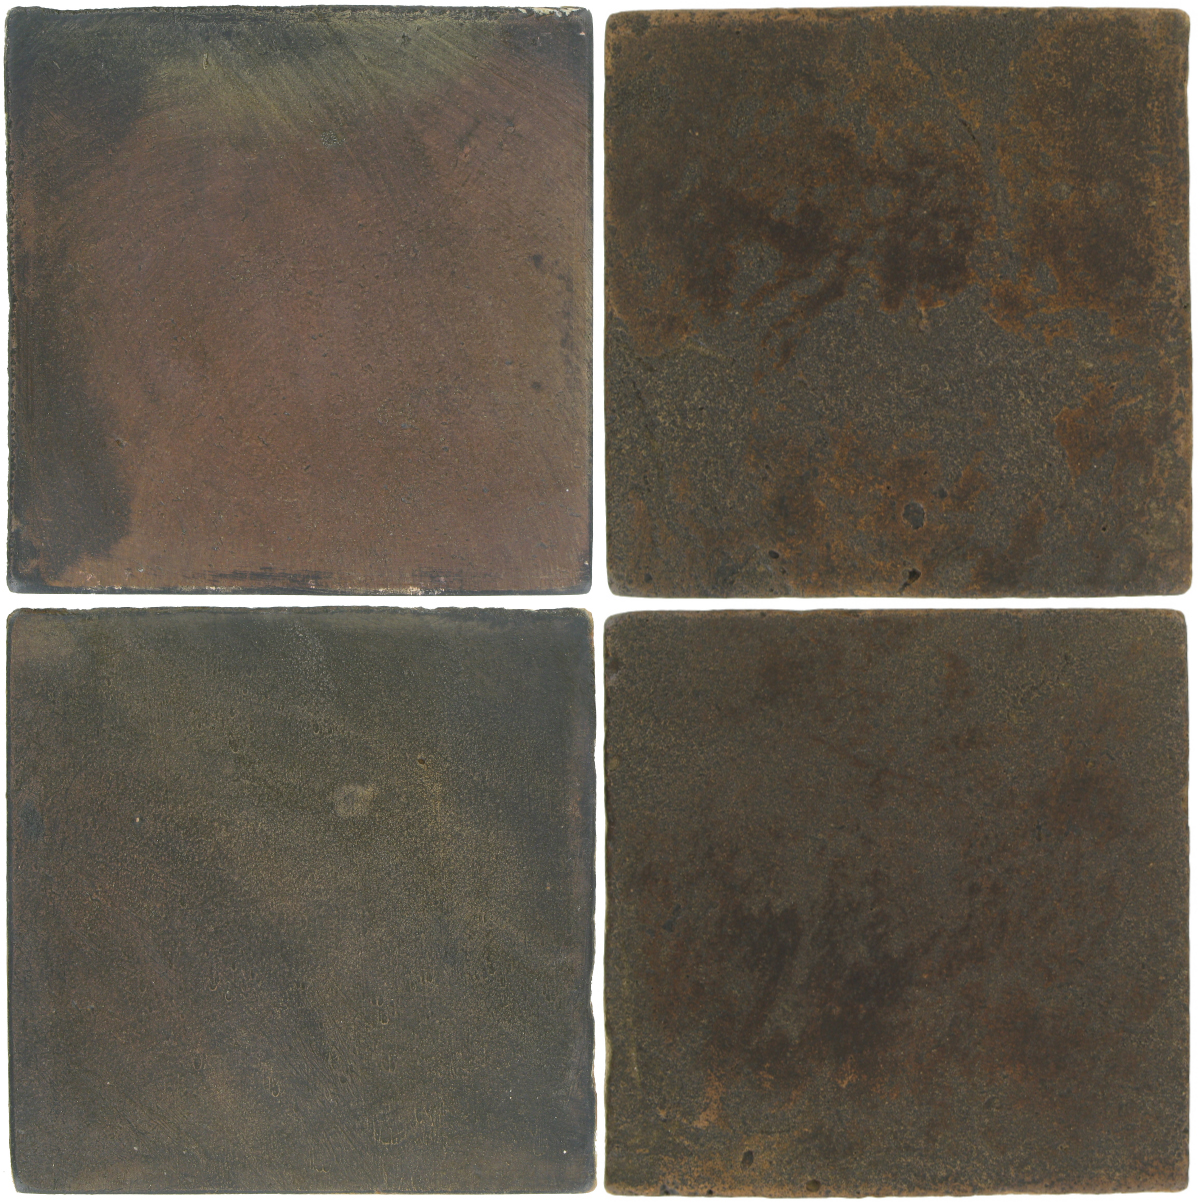 Pedralbes Antique Terracotta  2 Color Combinations  OHS-PSTG Terra Grey + VTG-PSCO Cologne Brown